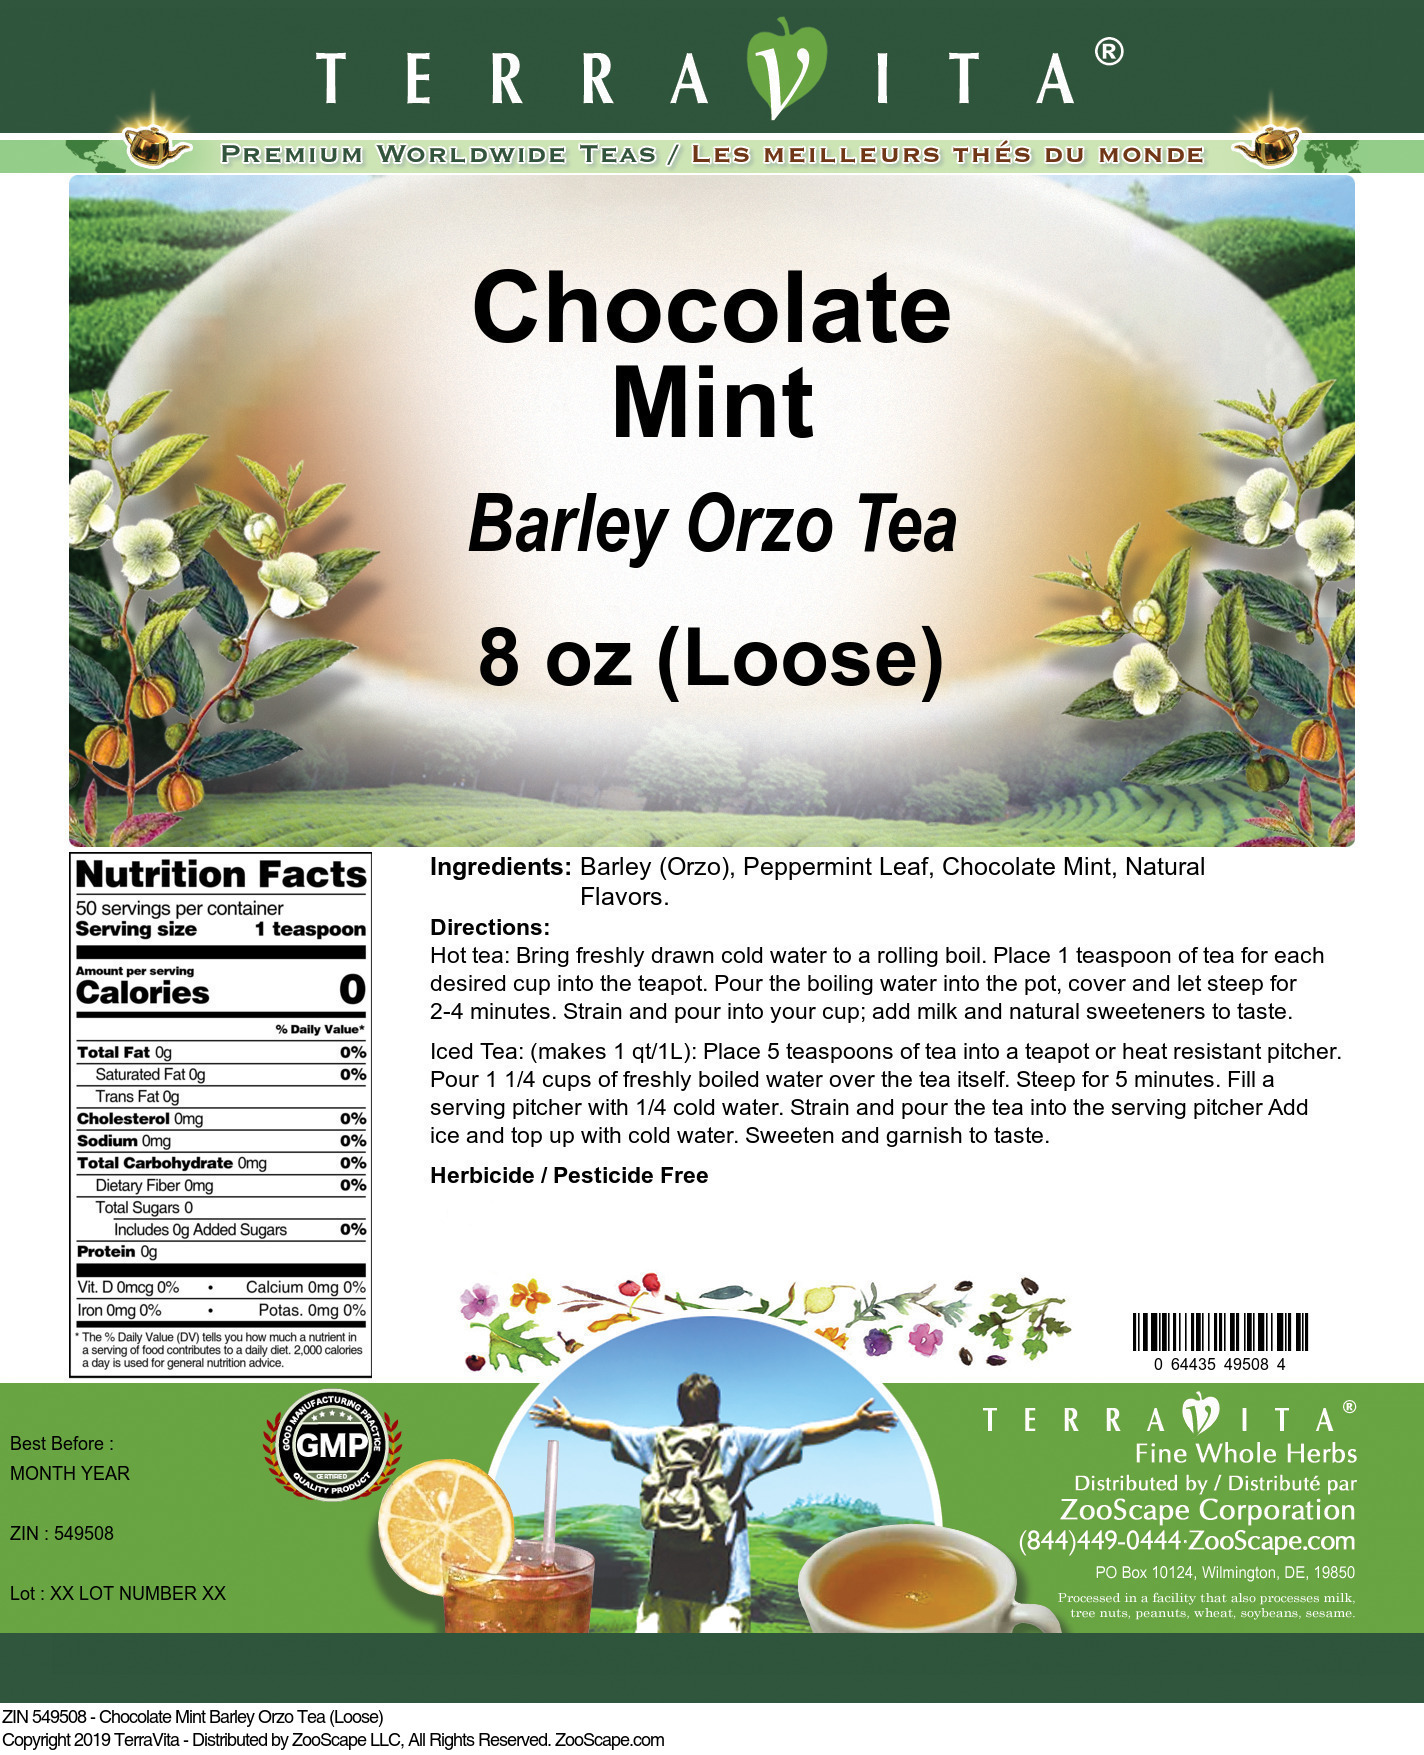 Chocolate Mint Barley Orzo Tea (Loose)